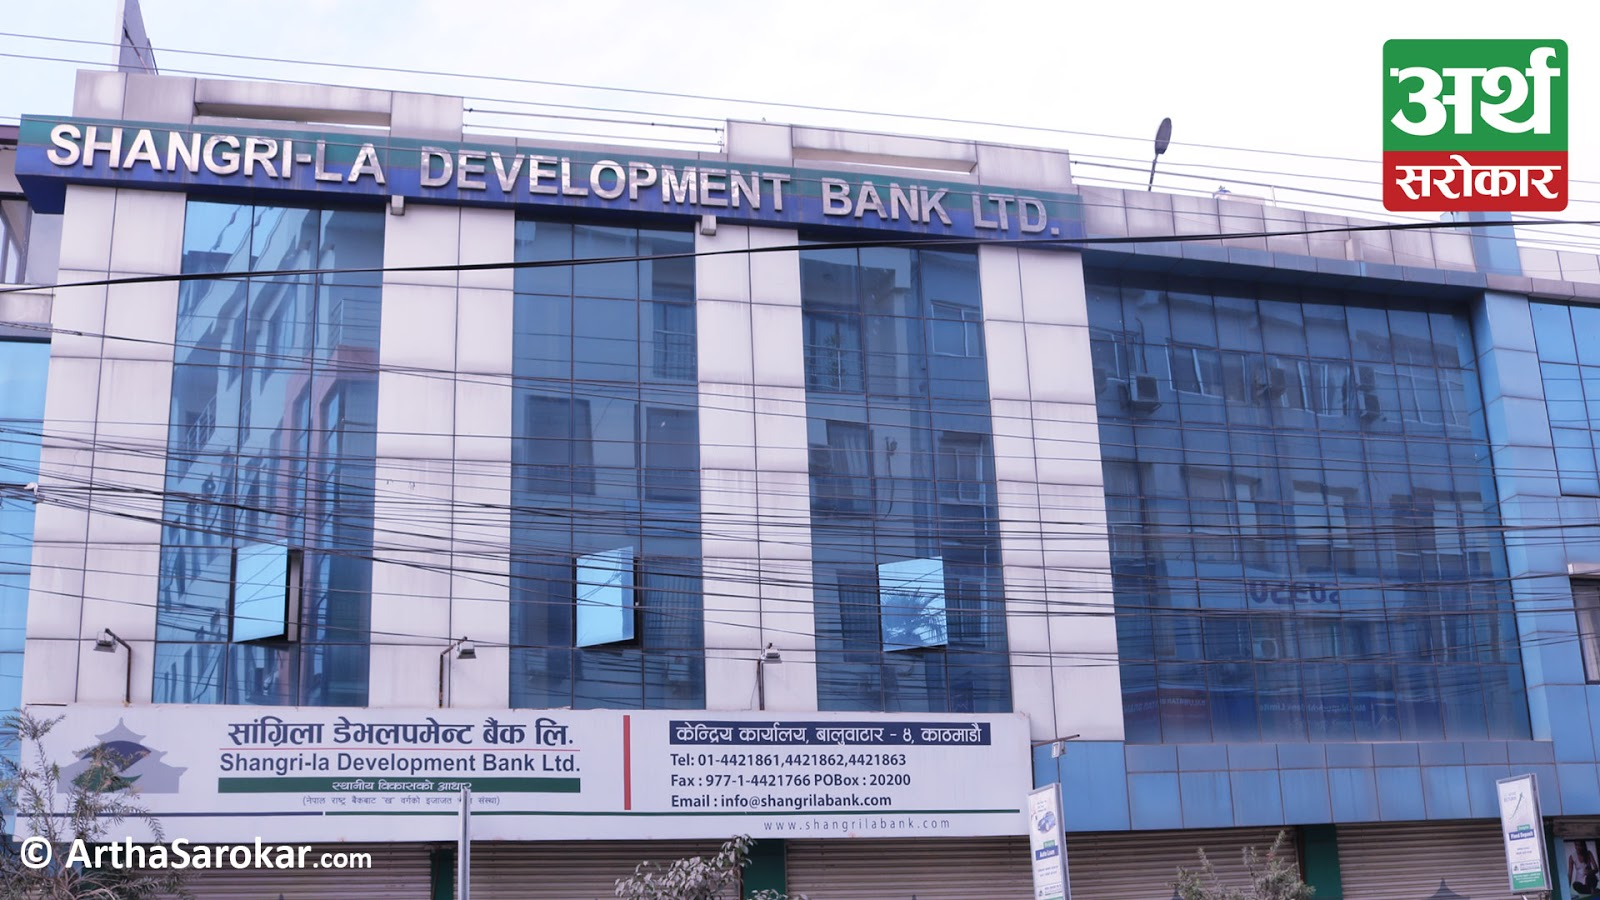 Sangrila Development Bank releases second quarter financial statements, earned net profit of Rs 164 million